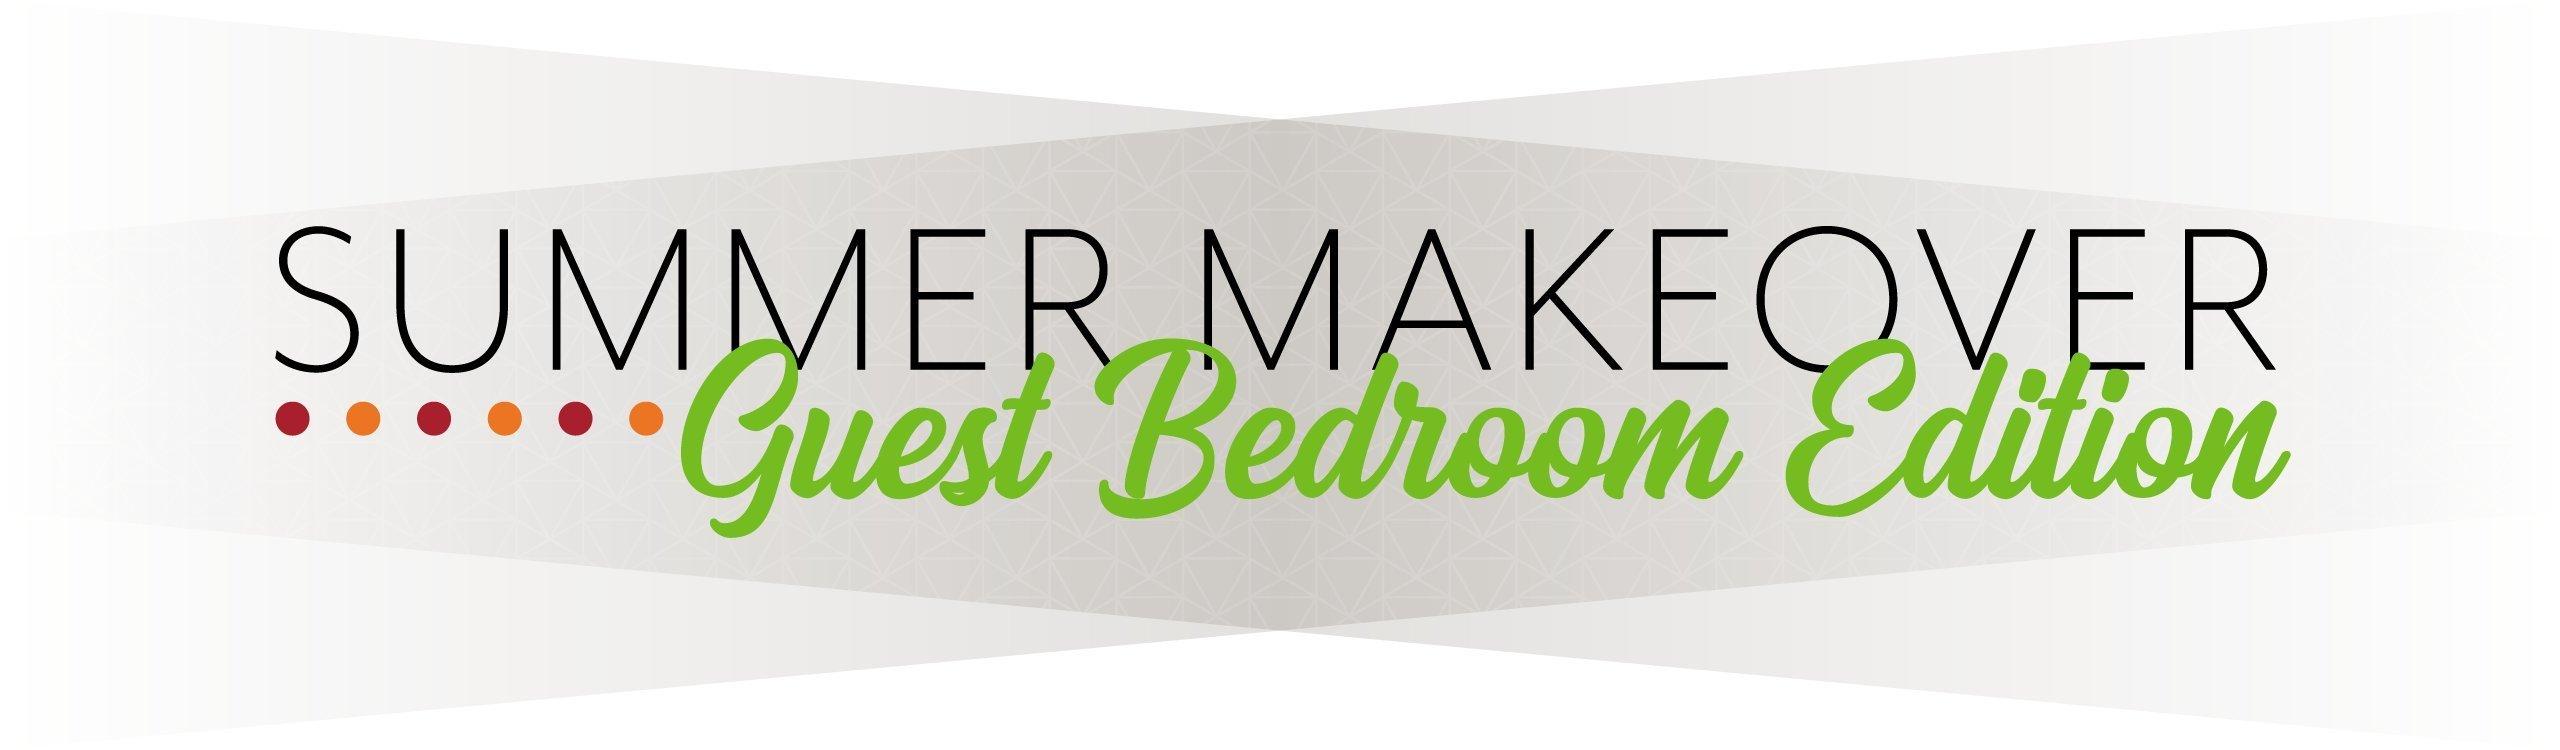 Guest Bedroom Edition